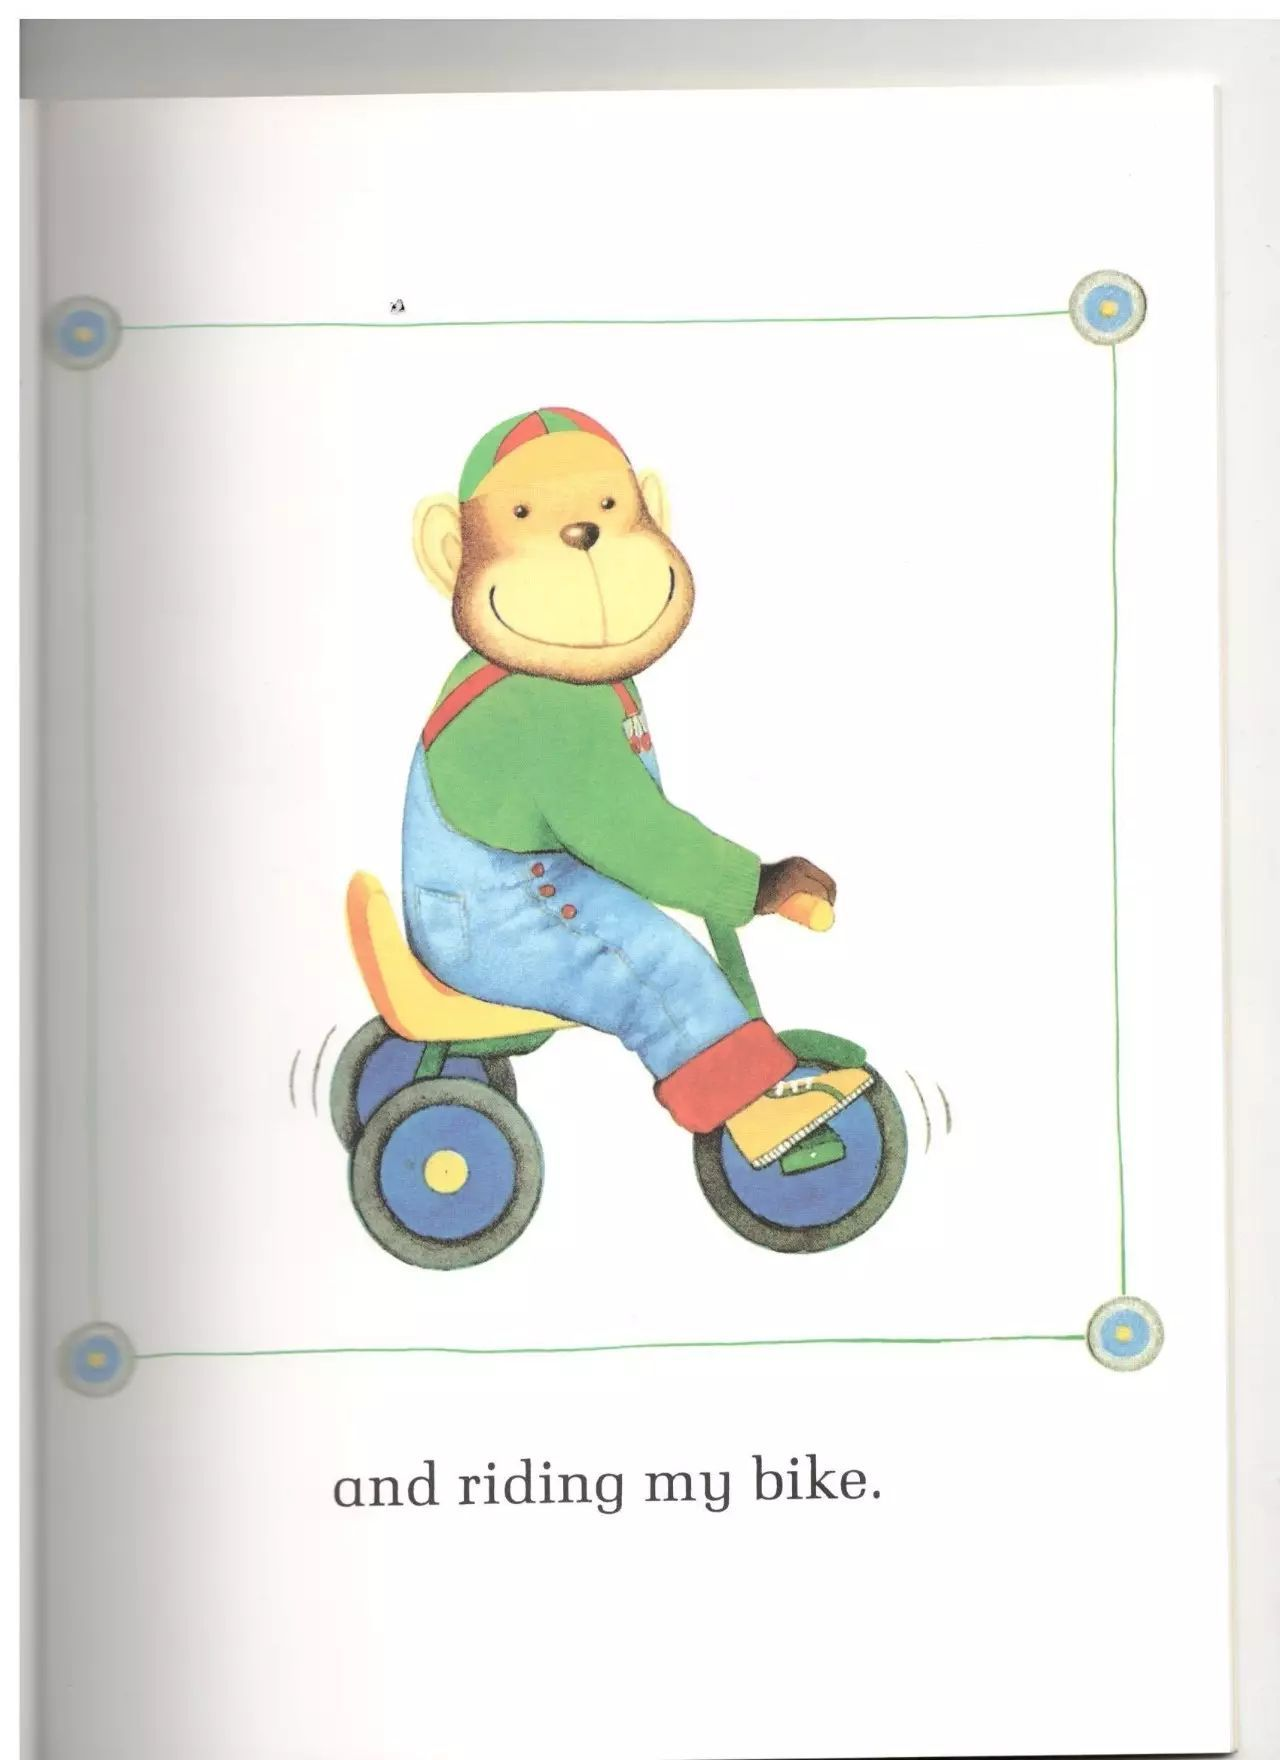 Things I Like 我喜欢的一切 -第4张图片-58绘本网-专注儿童绘本批发销售。